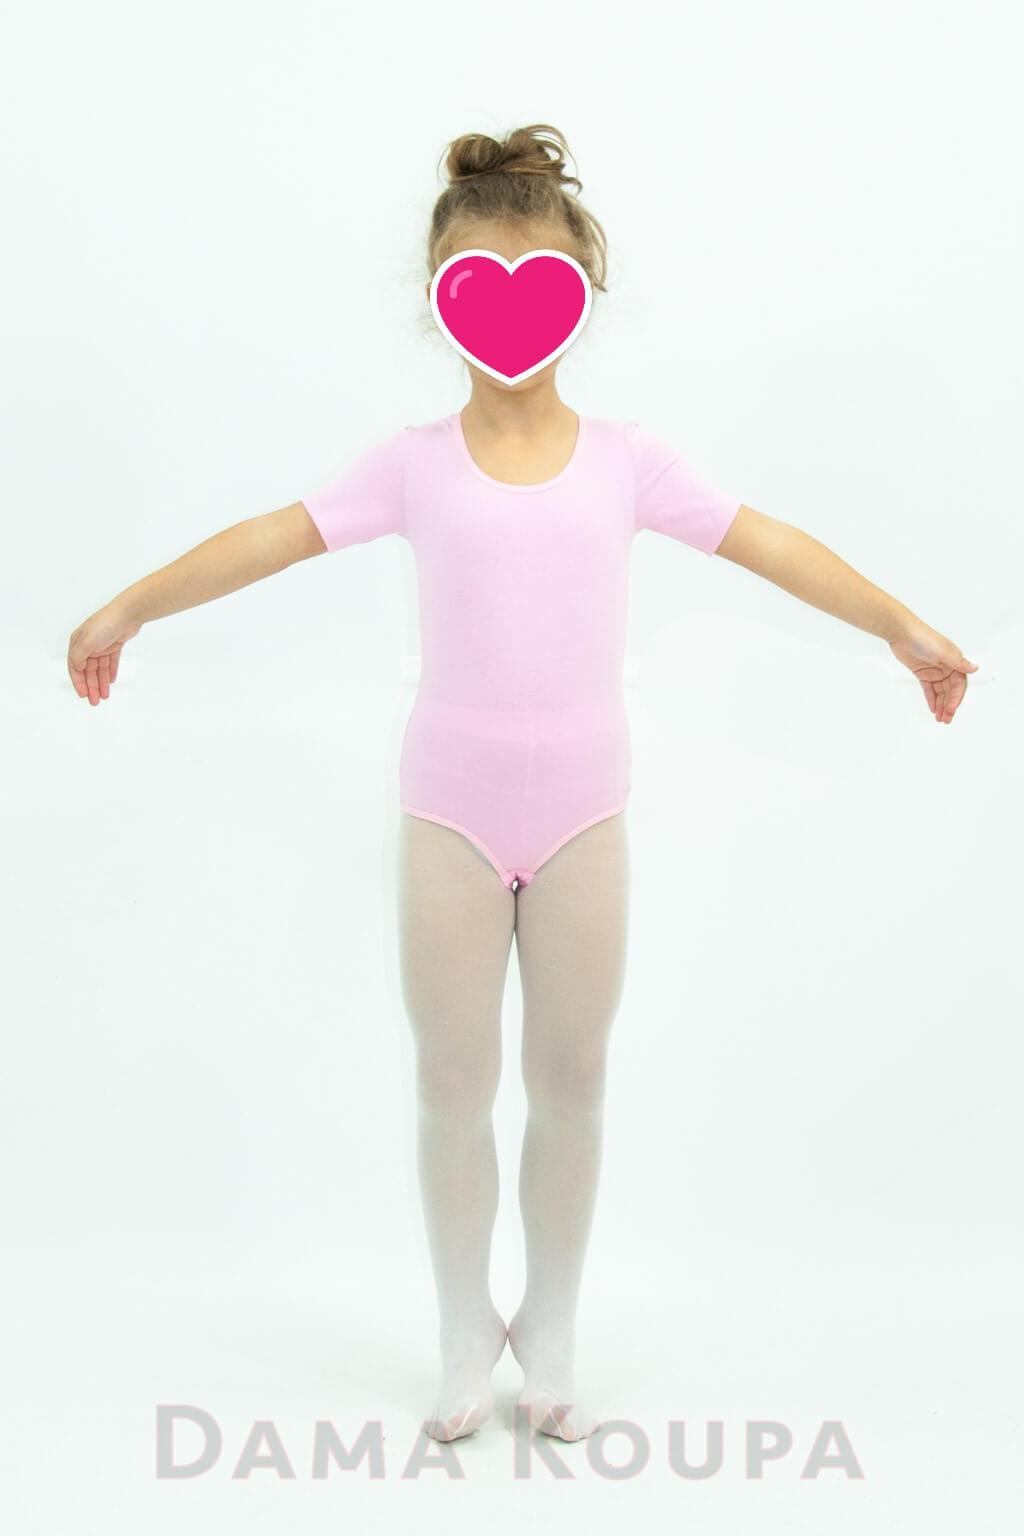 c5dbff8b09a Παιδικό κορμάκι βαμβακολύκρα με κοντό μανίκι ροζ Dama Koupa